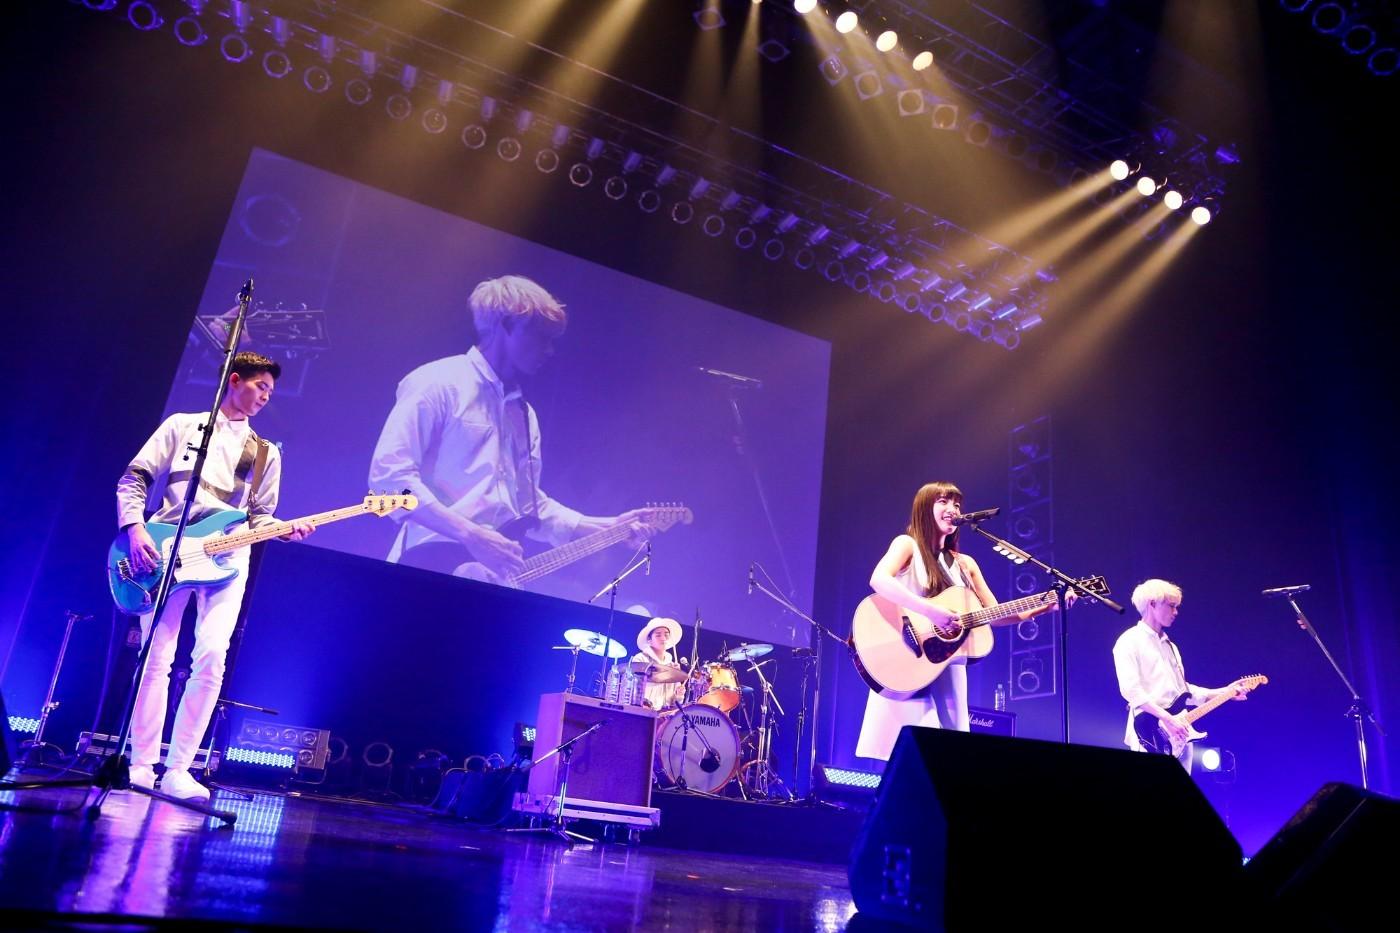 miwa、坂口健太郎、竜星涼、泉澤祐希らThe STROBOSCORP